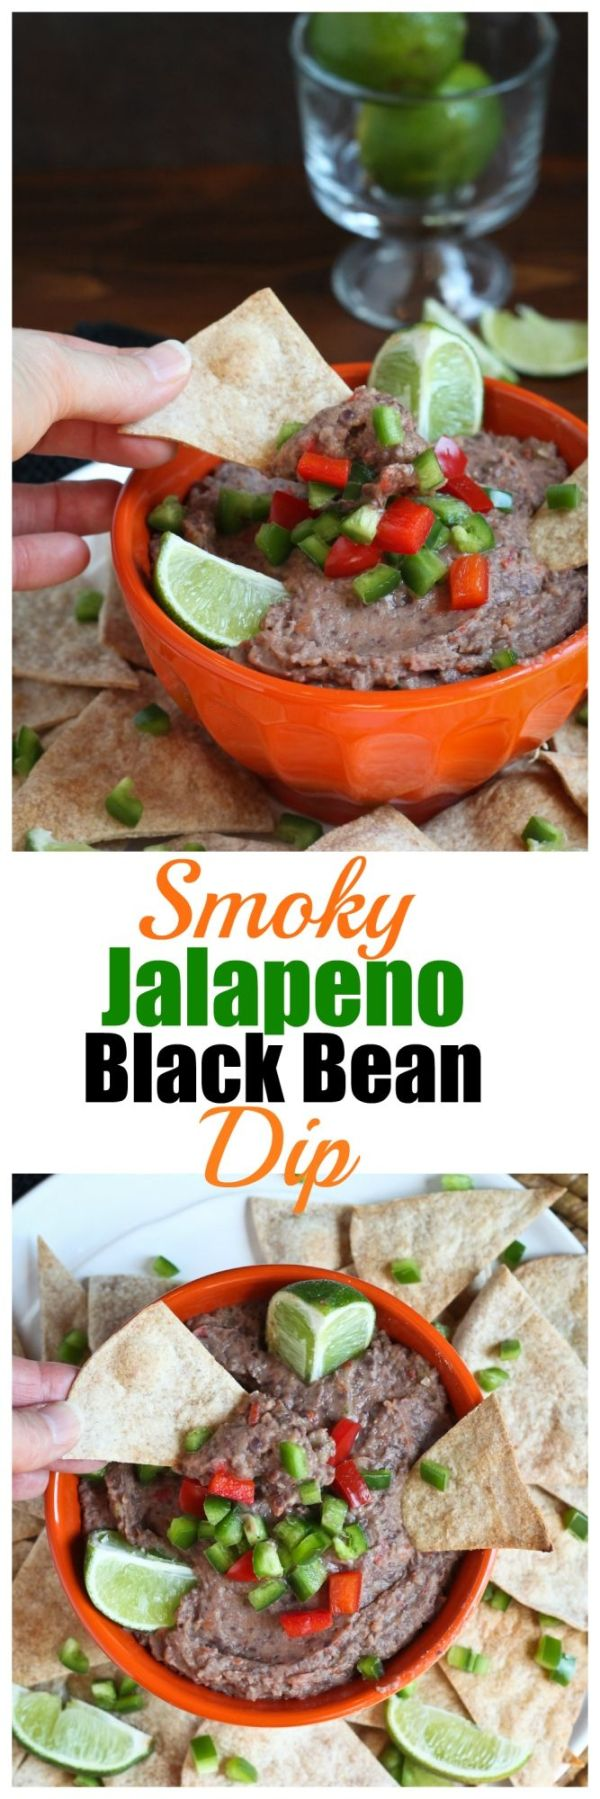 Best 20 Jalapeno dip ideas on Pinterest